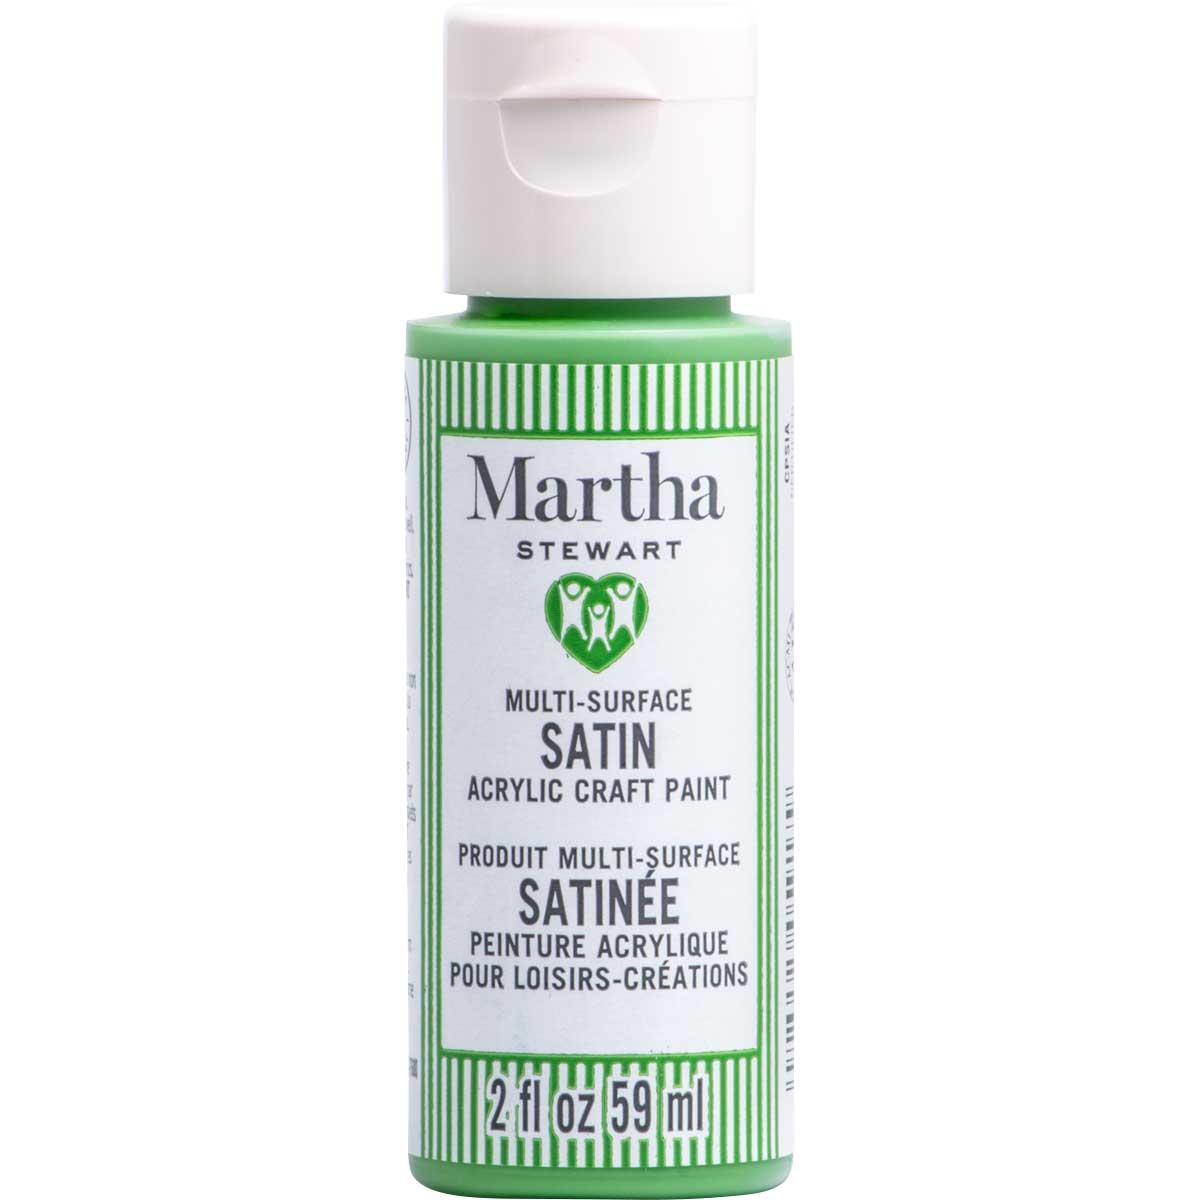 Martha Stewart ® Multi-Surface Satin Acrylic Craft Paint CPSIA - Tree Top, 2 oz. - 5917